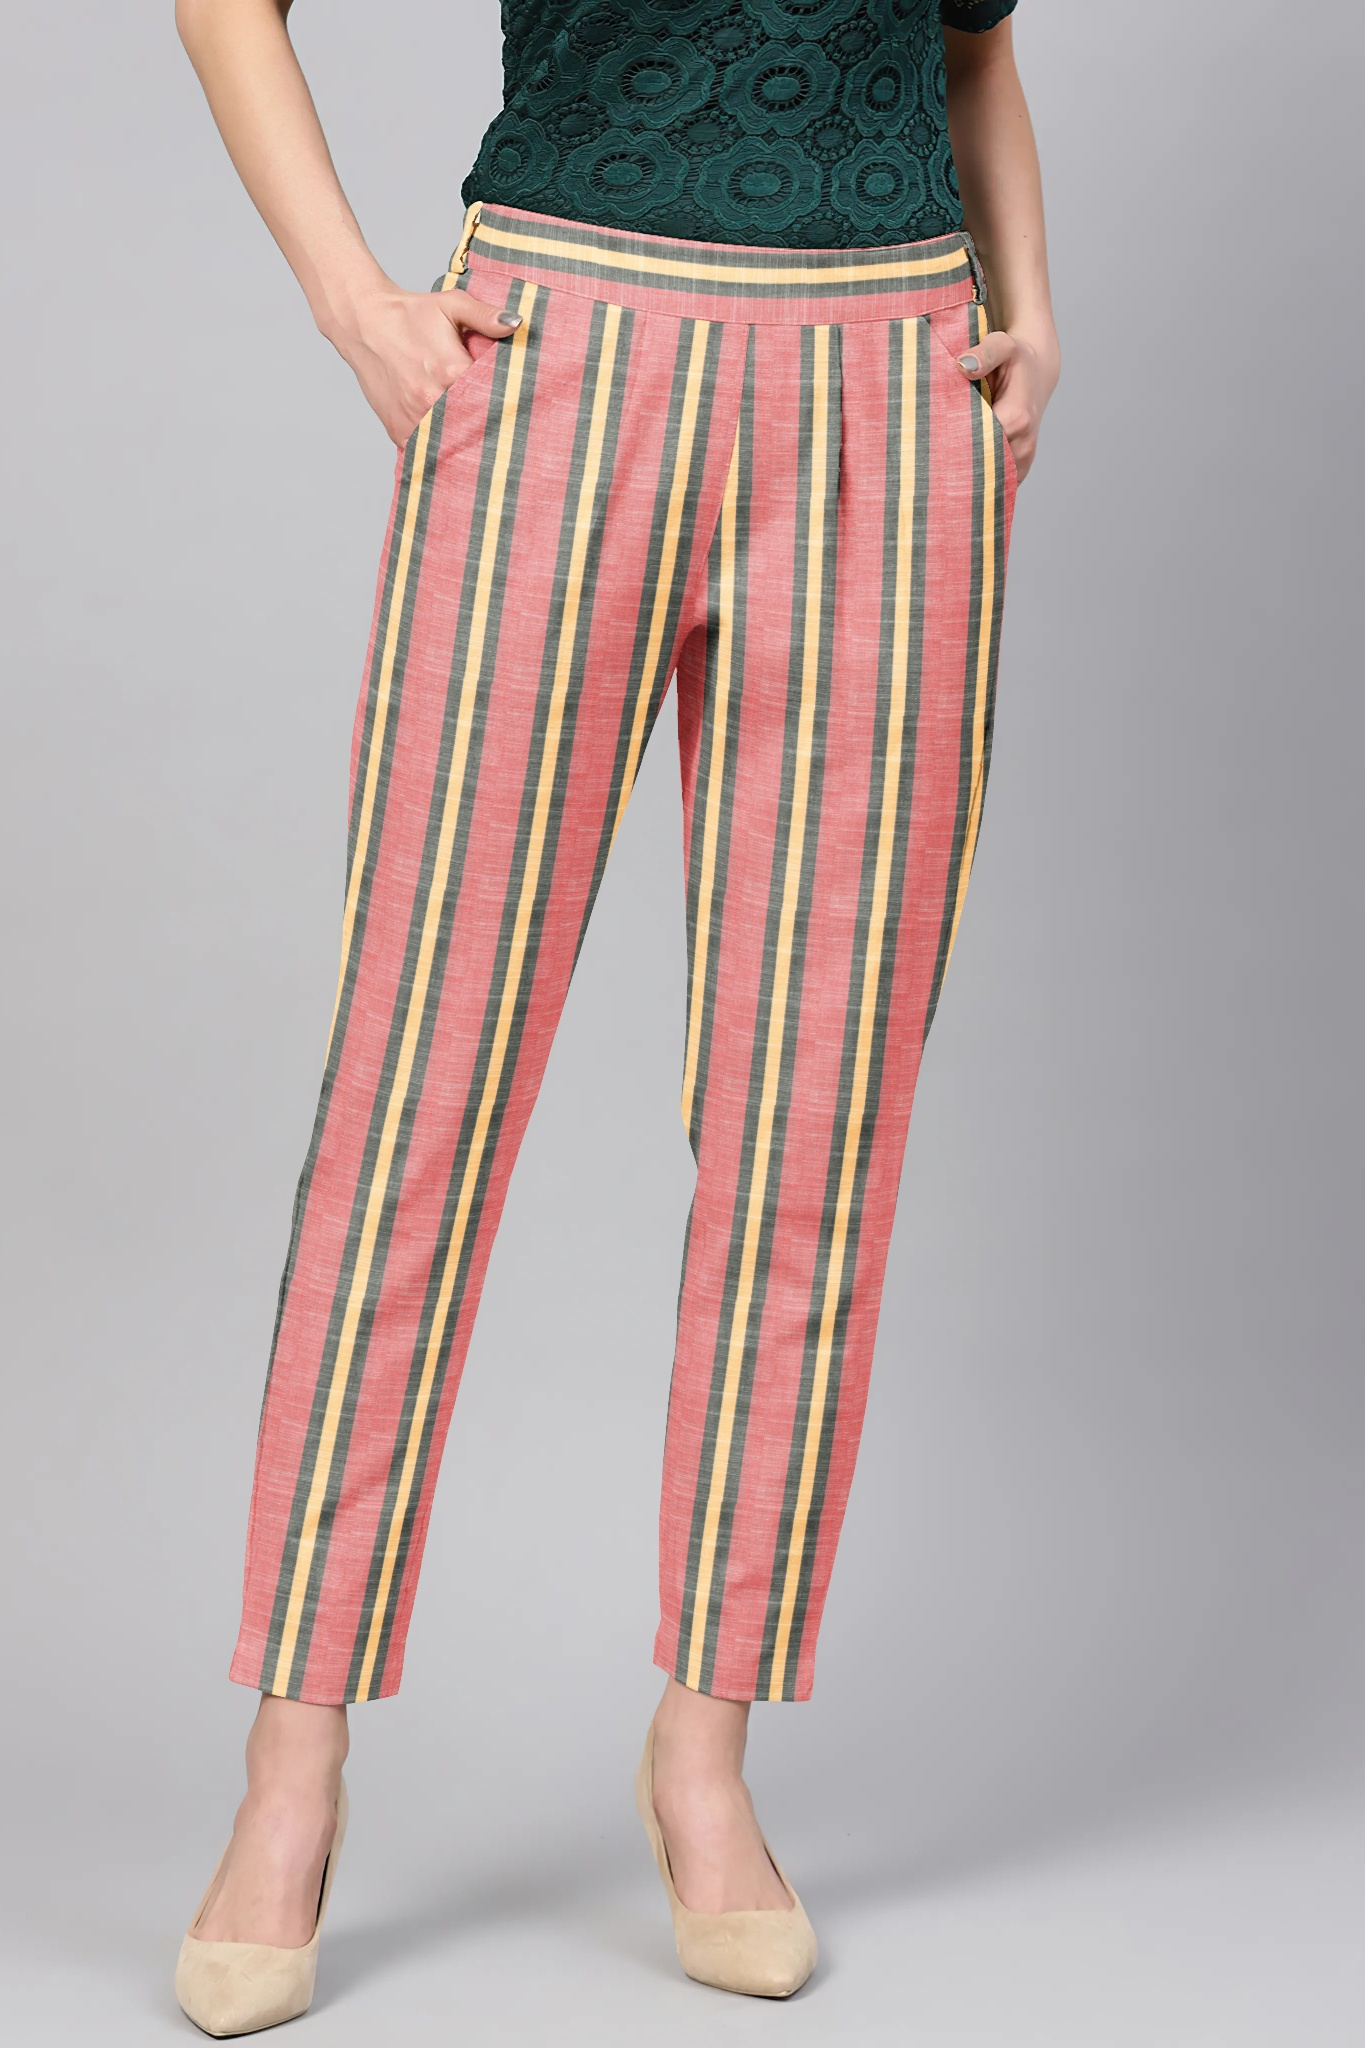 /home/customer/www/fabartcraft.com/public_html/uploadshttps://www.shopolics.com/uploads/images/medium/Pink-Yellow-Cotton-Stripe-Regular-Fit-Solid-Trouser-36086.jpg